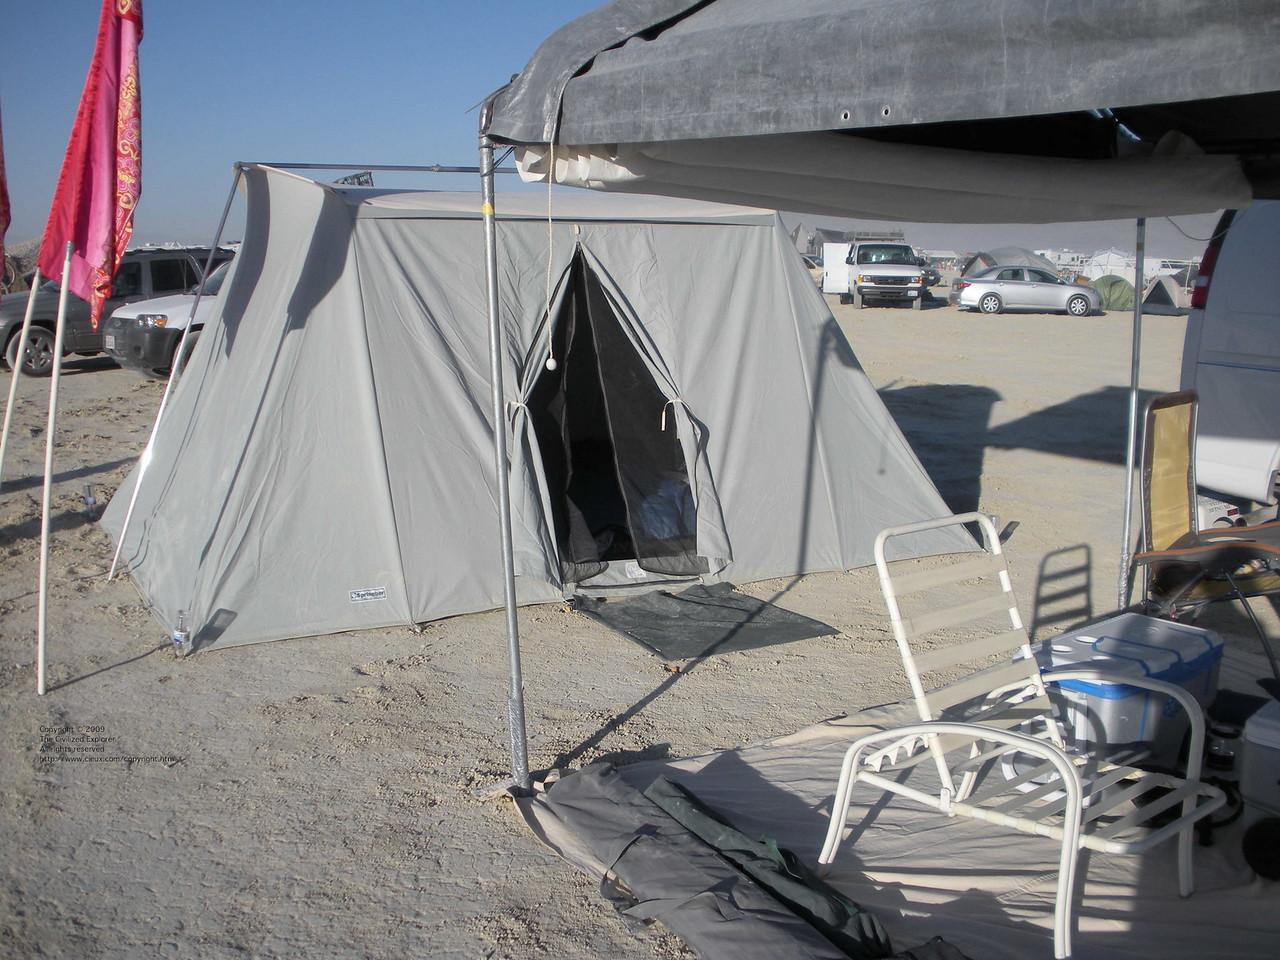 Our Springbar tent. & civex Photo Keywords: Springbar tent